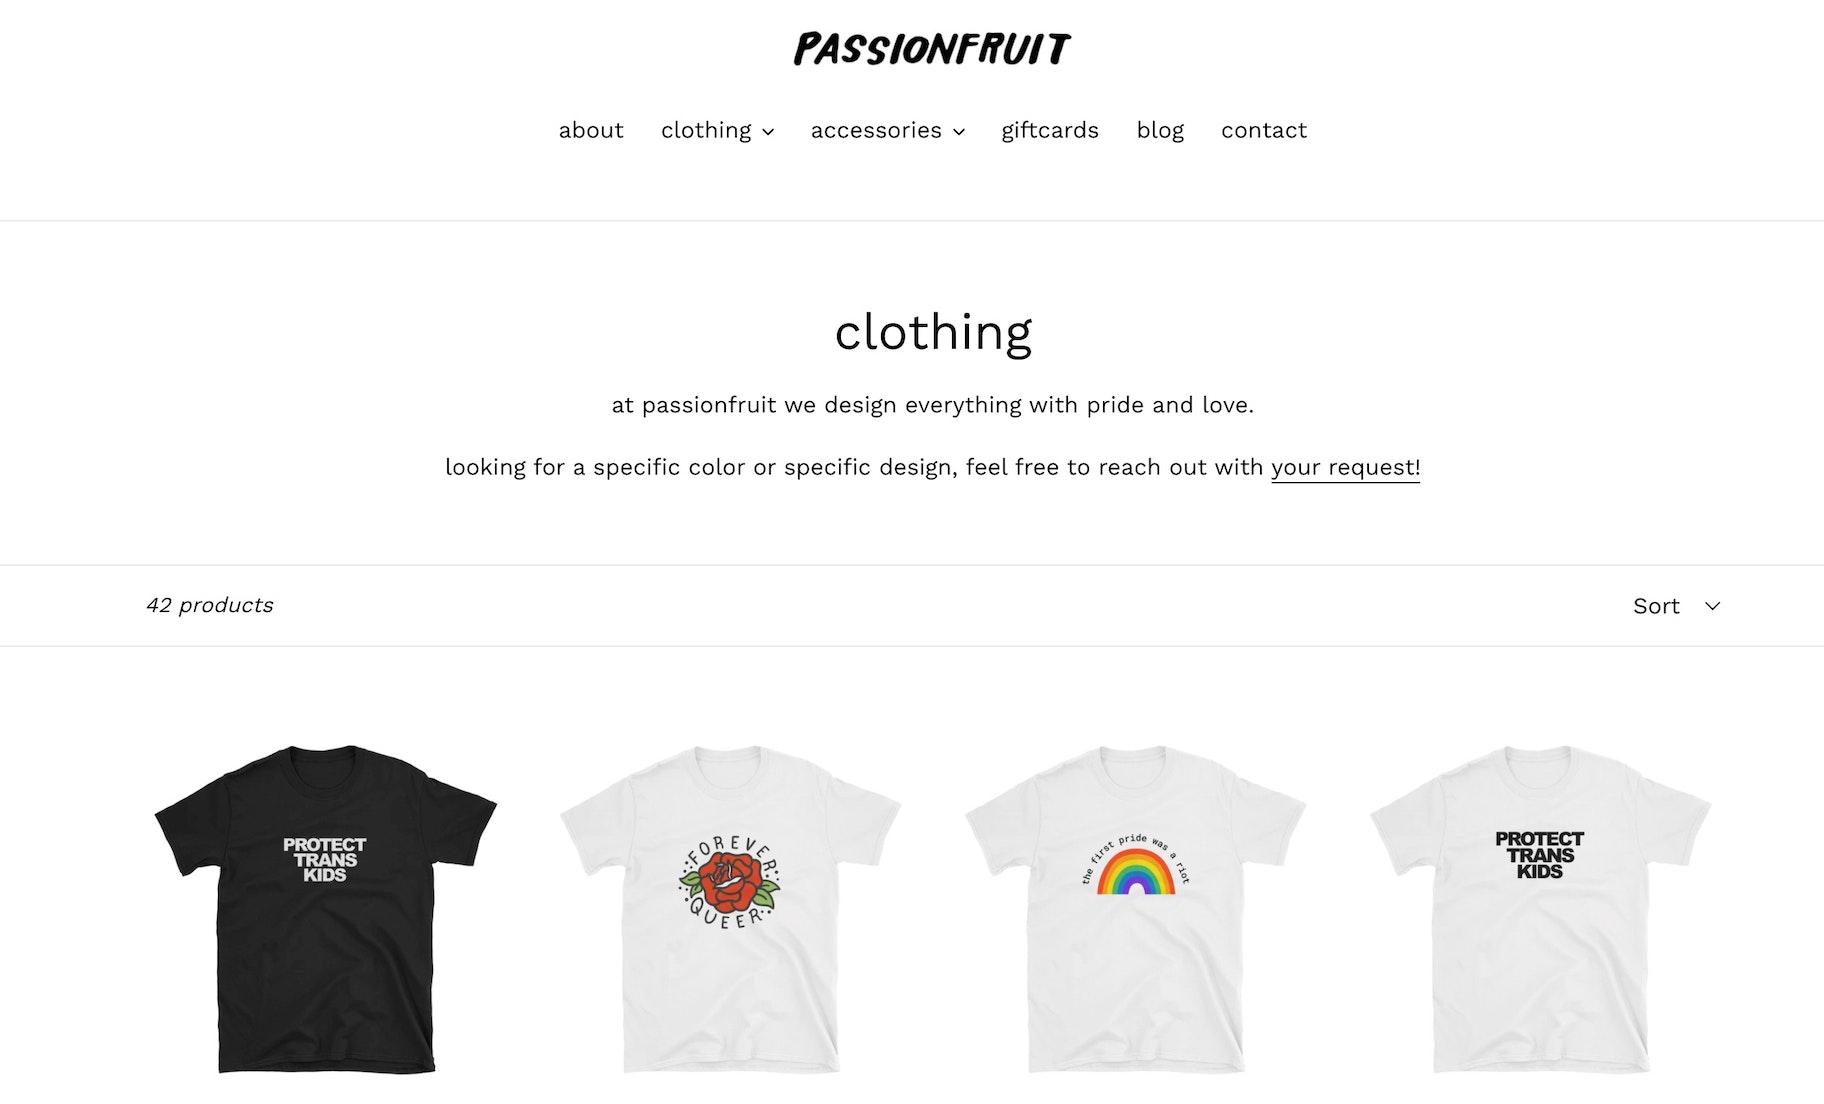 passionfruit vision statement